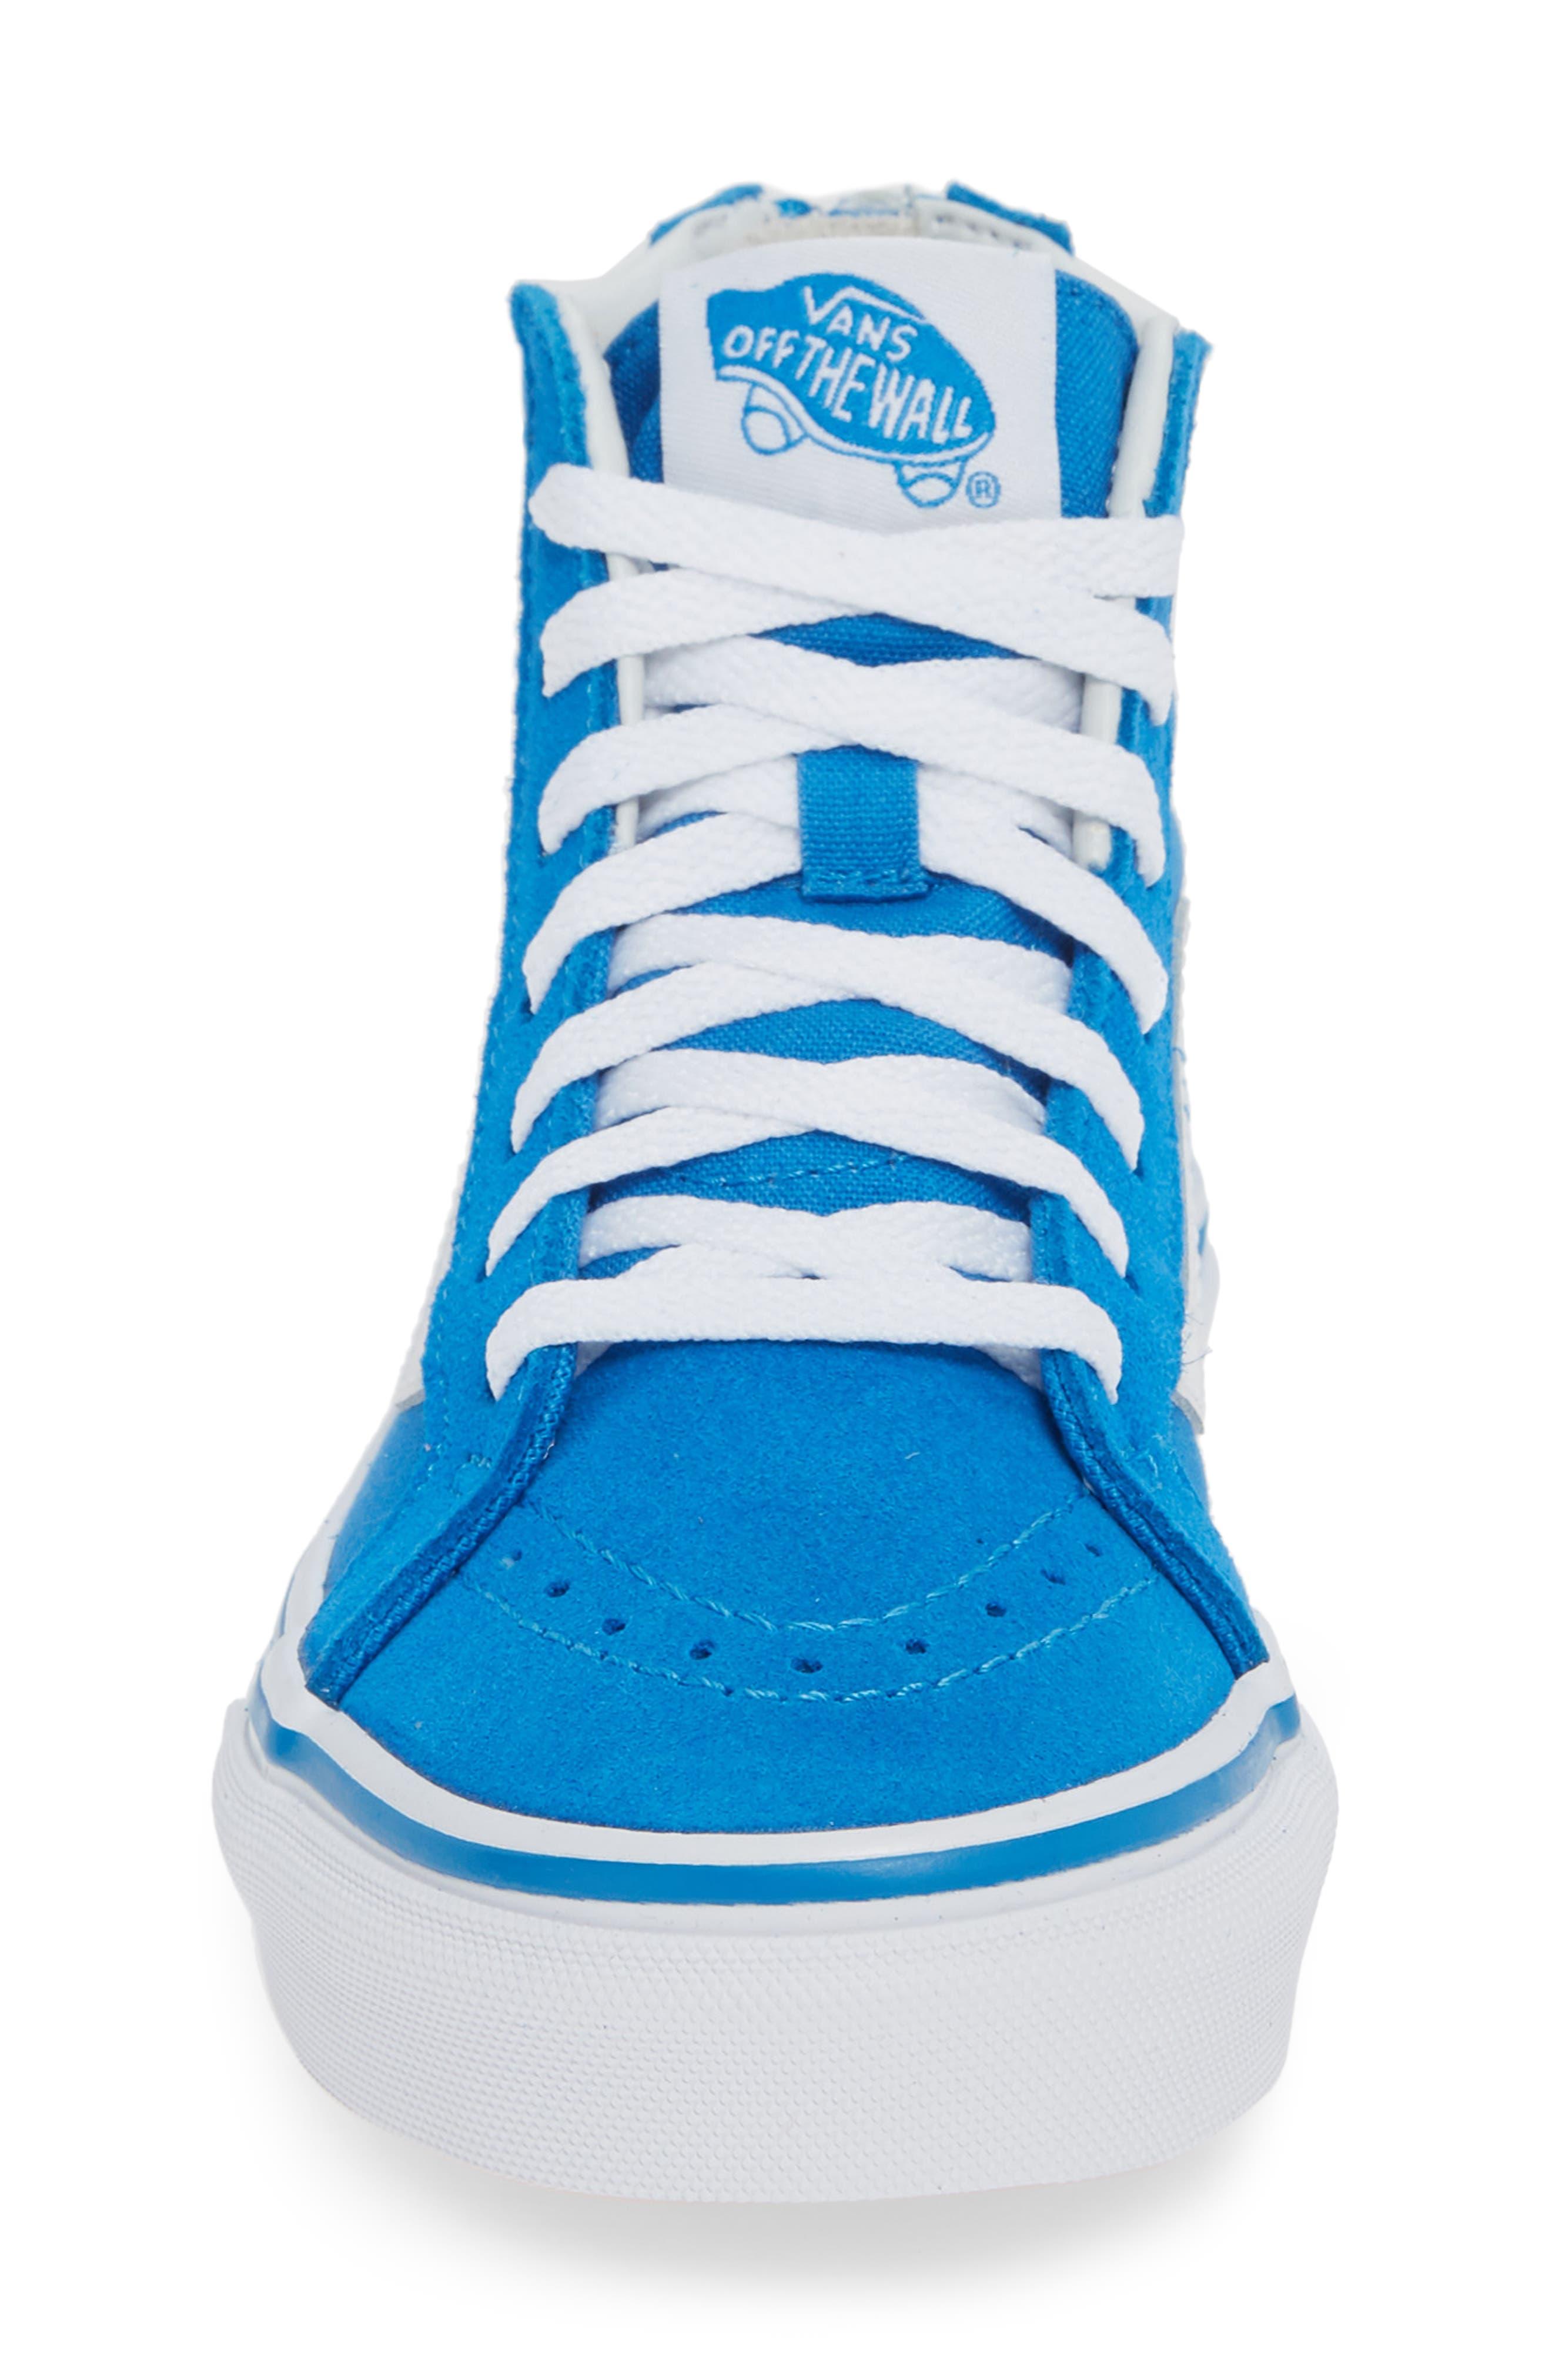 VANS, 'Sk8-Hi' Sneaker, Alternate thumbnail 4, color, INDIGO BUNTING/ TRUE WHITE